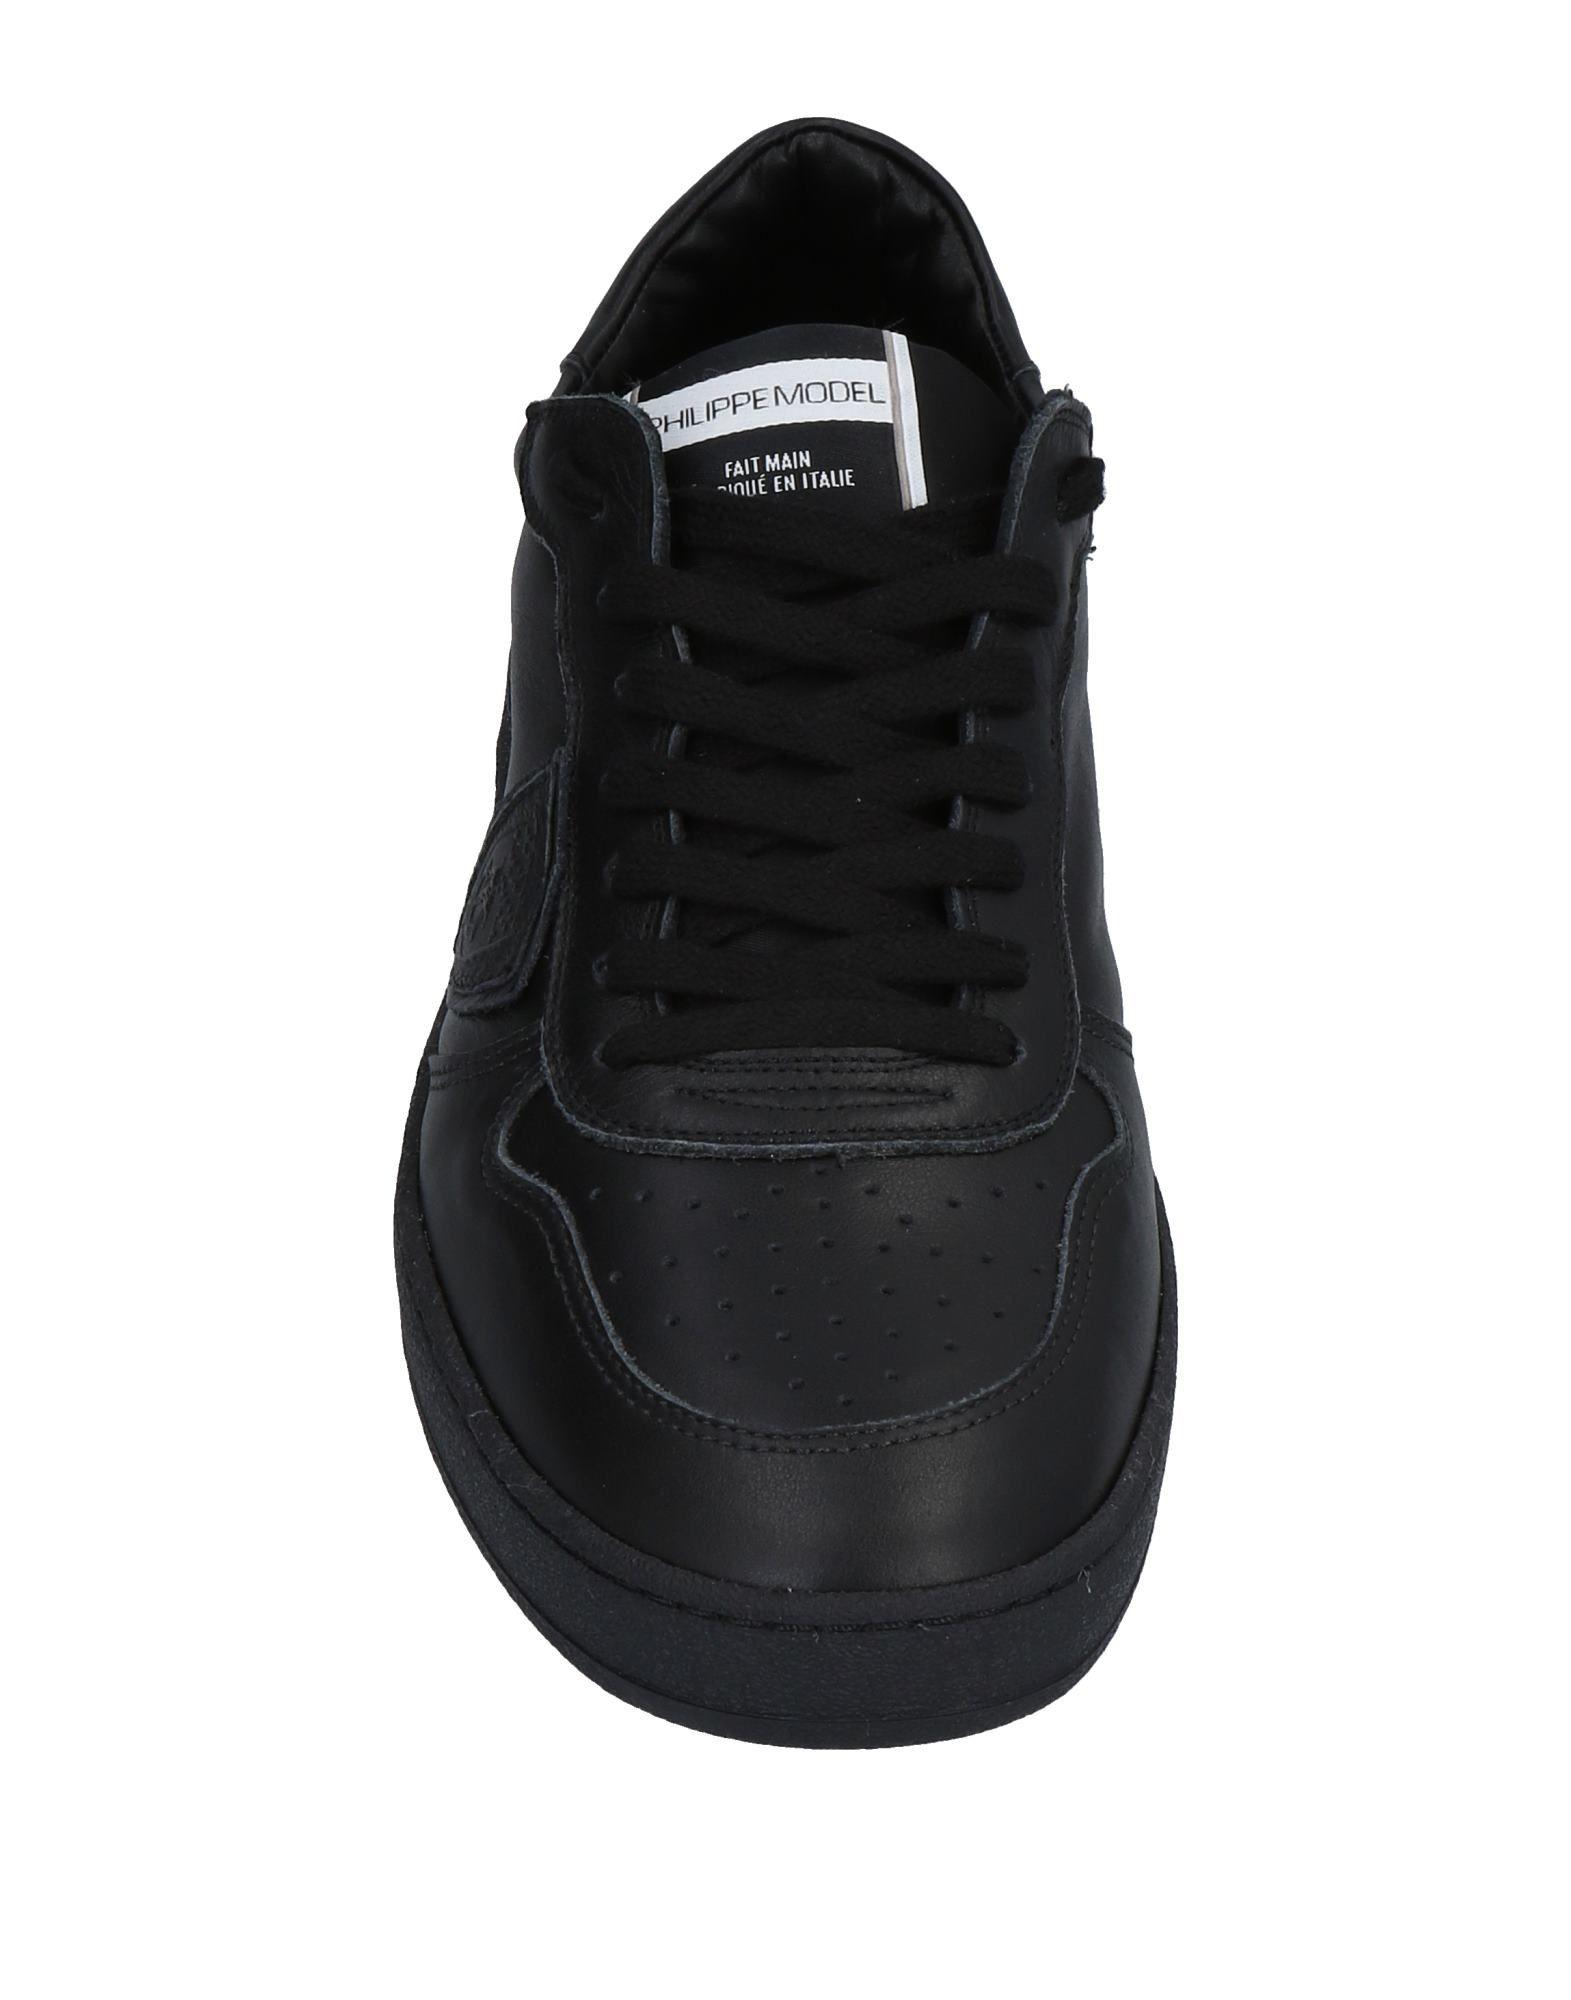 Philippe Model Sneakers Herren  11482198HC Gute Gute Gute Qualität beliebte Schuhe 7dc613